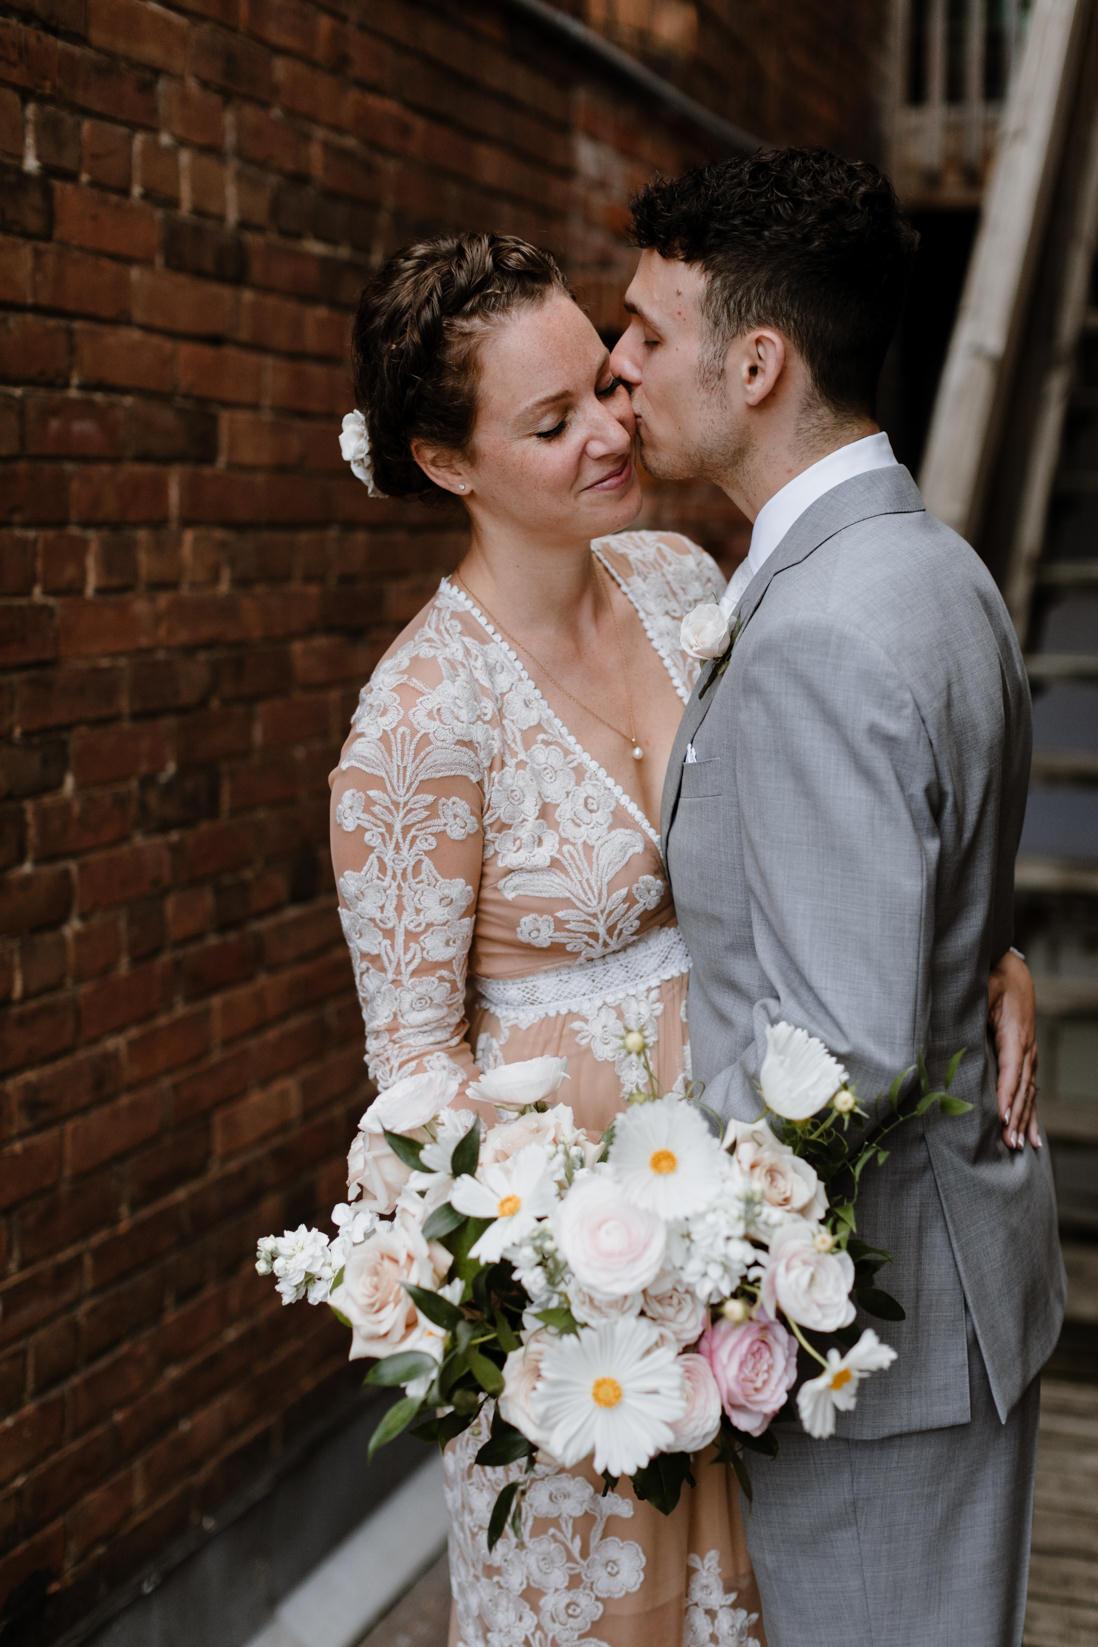 wedding portrait in alley brick walls urban wedding Toronto_EightyFifth Street Photography